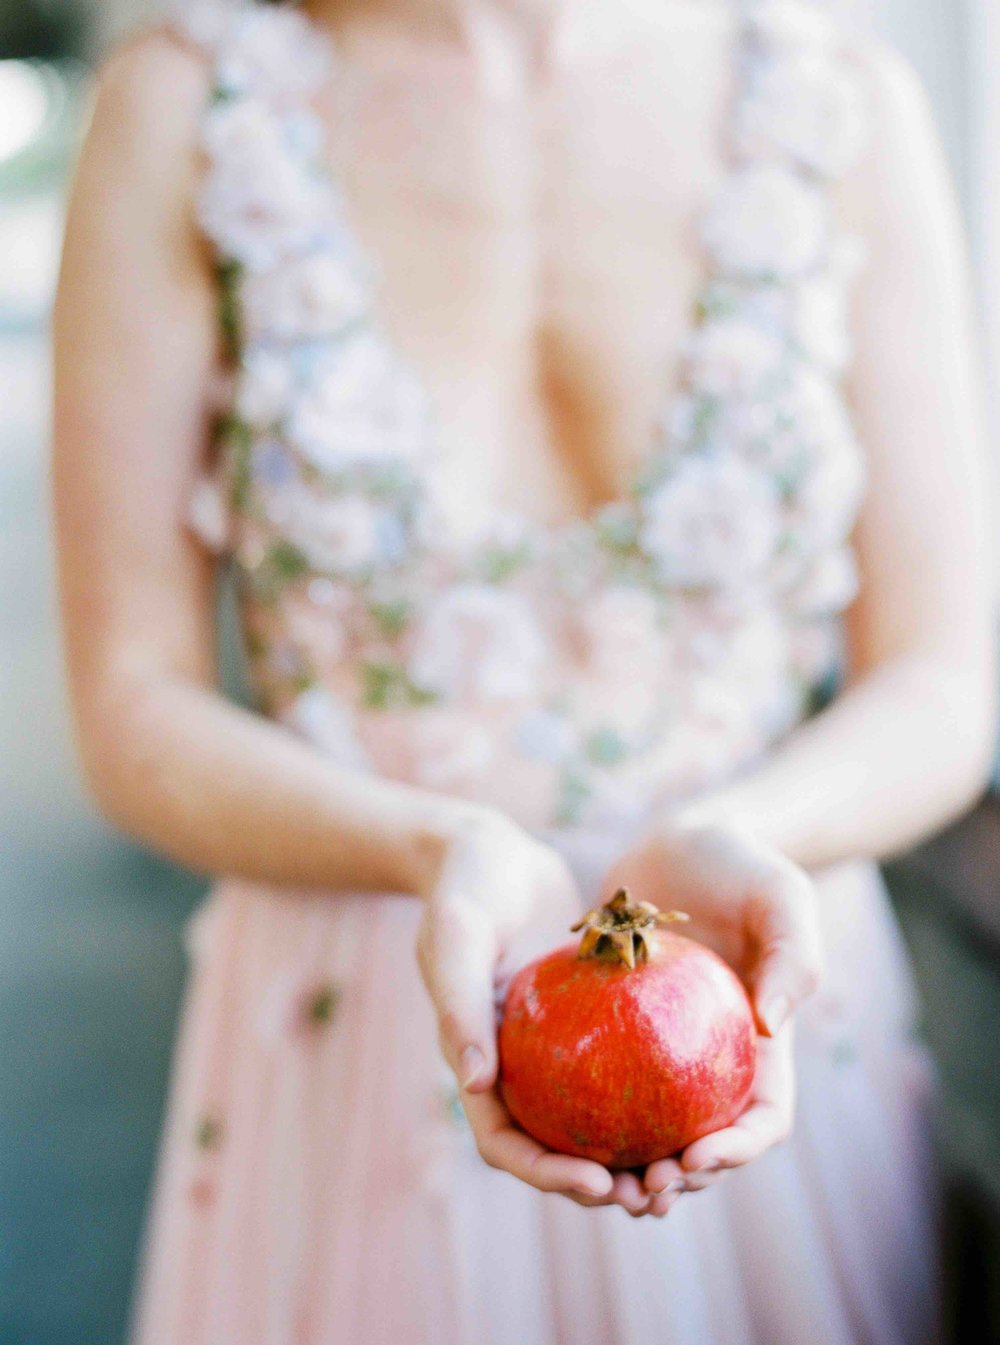 MarryMeBureau-MarinaBaum-Festtagsfotografien_BeretKah-Collection2016-88.jpg